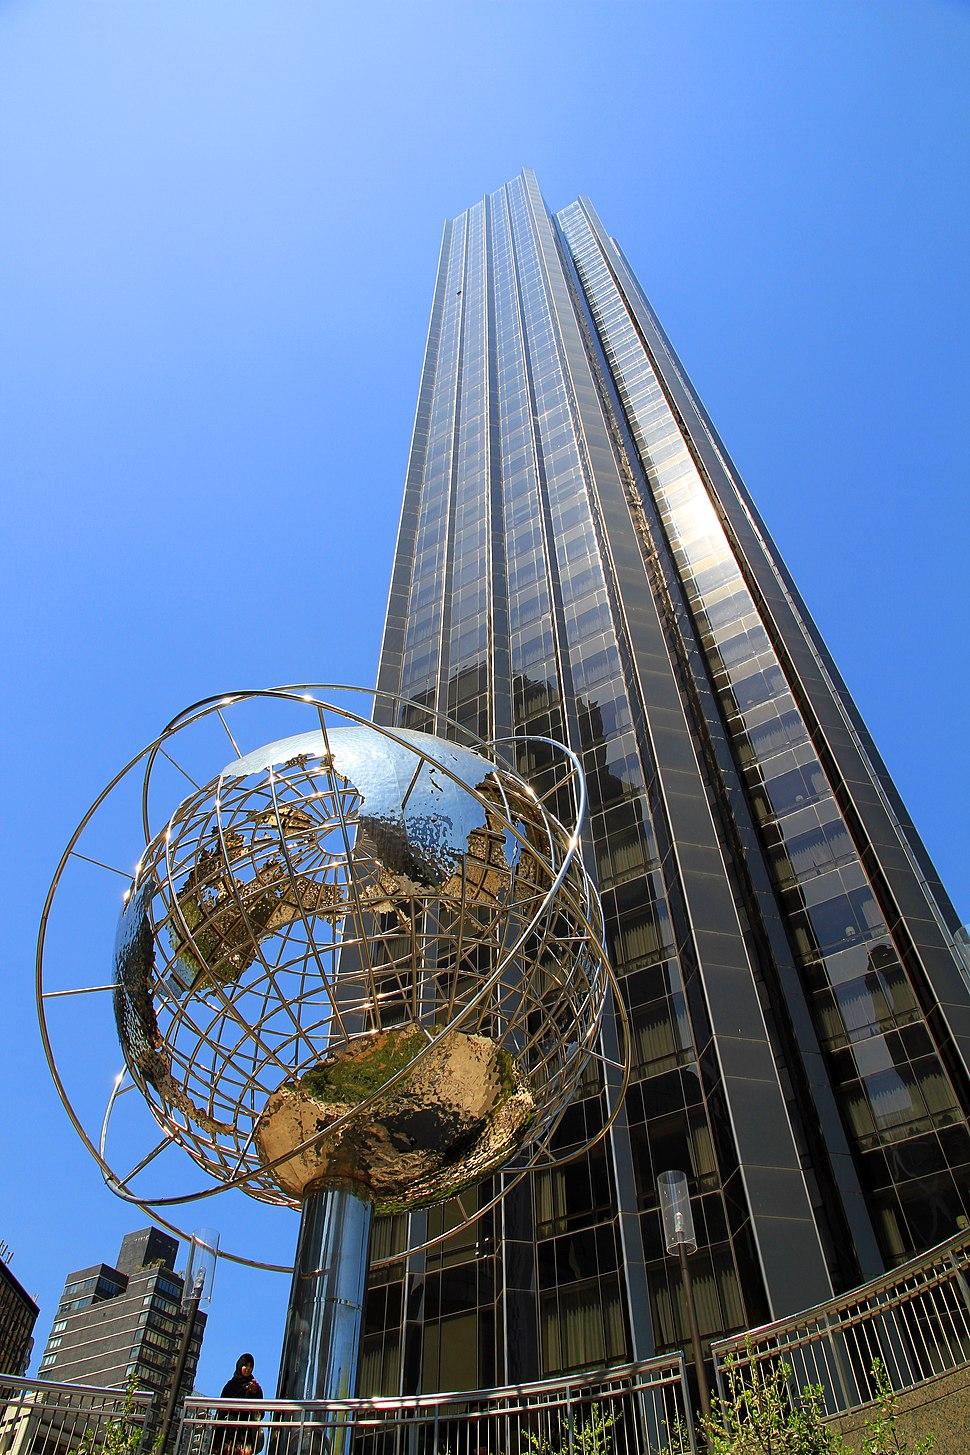 4118-NYC-Columbus Circle